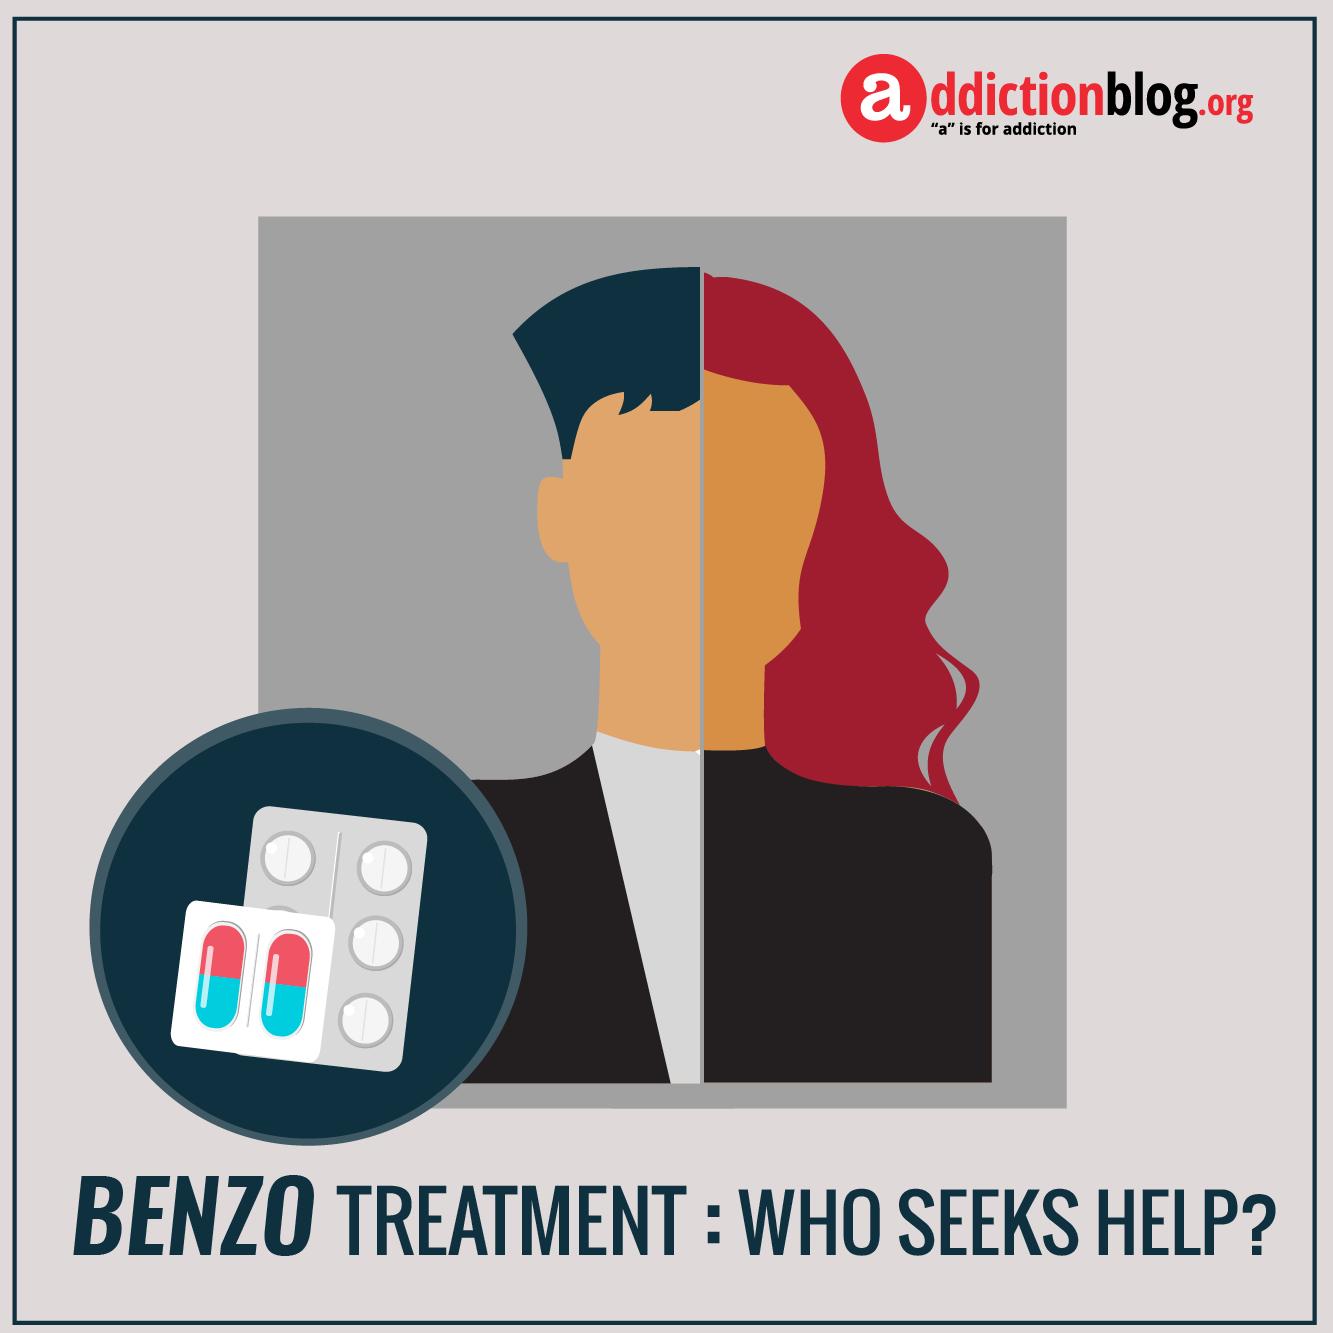 Benzo addiction rehab: Who needs benzodiazepine treatment? (INFOGRAPHIC)